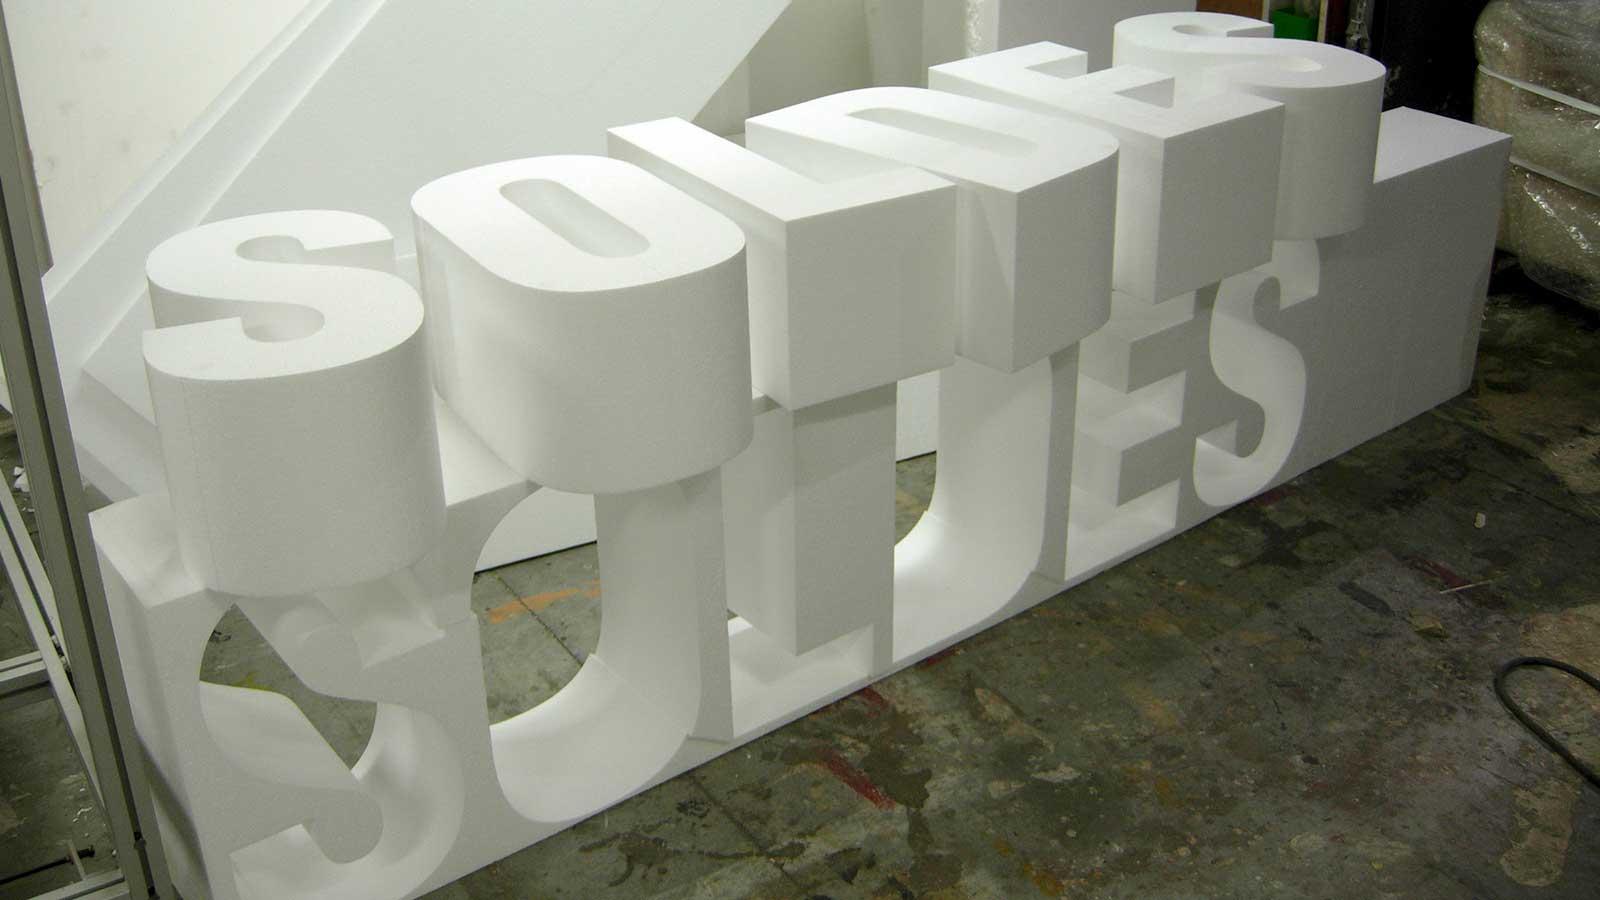 Lifestyle conseils astuces - Comment coller du polystyrene ...